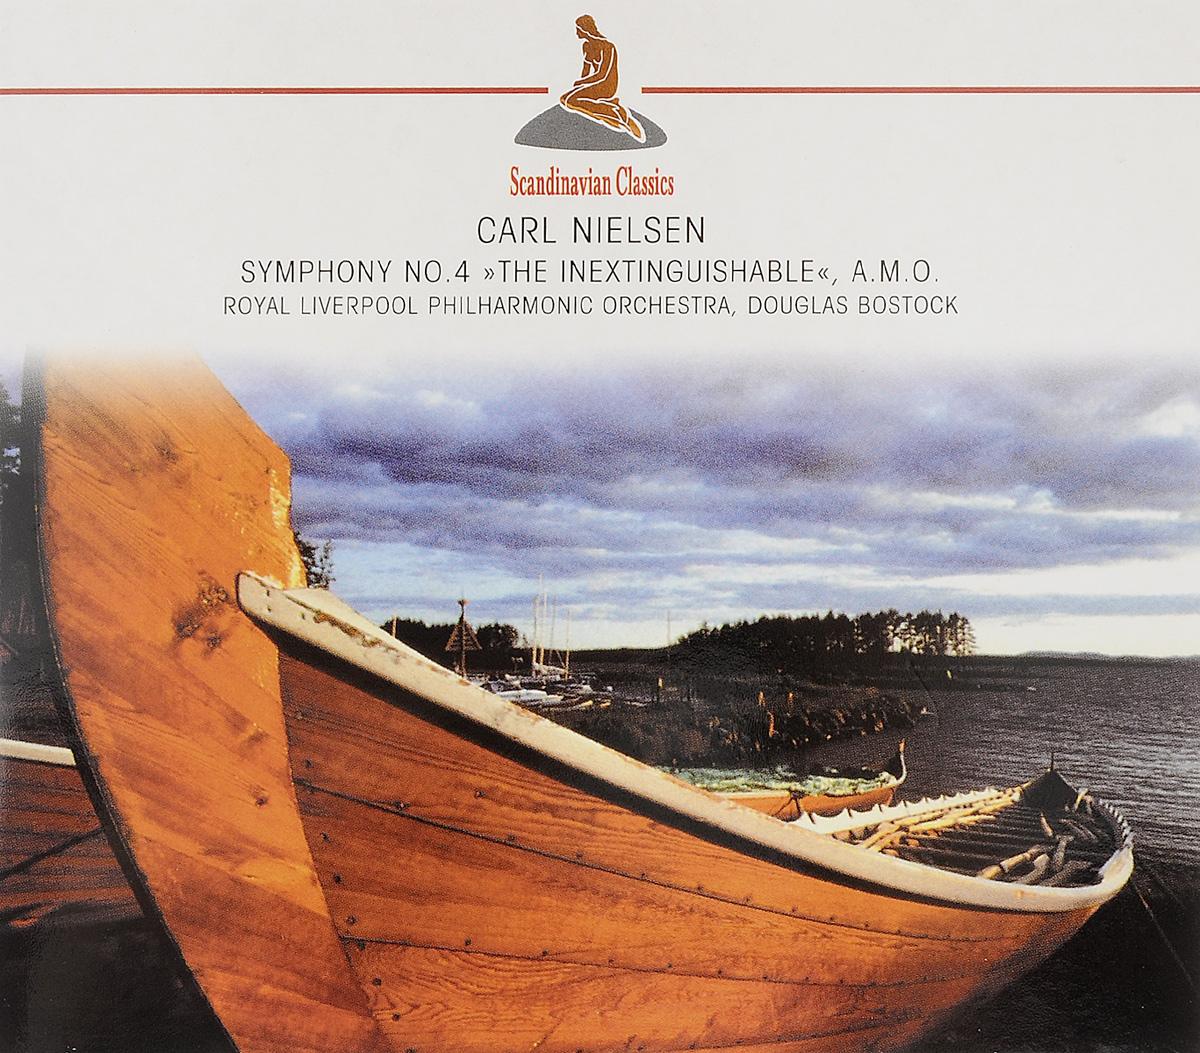 Royal Liverpool Philharmonic Orchestra,Дуглас Босток Scandinavian Classics. Royal Liverpool Philharmonic Orchestra, Douglas Bostock. Nielsen. Sinfonie No.4